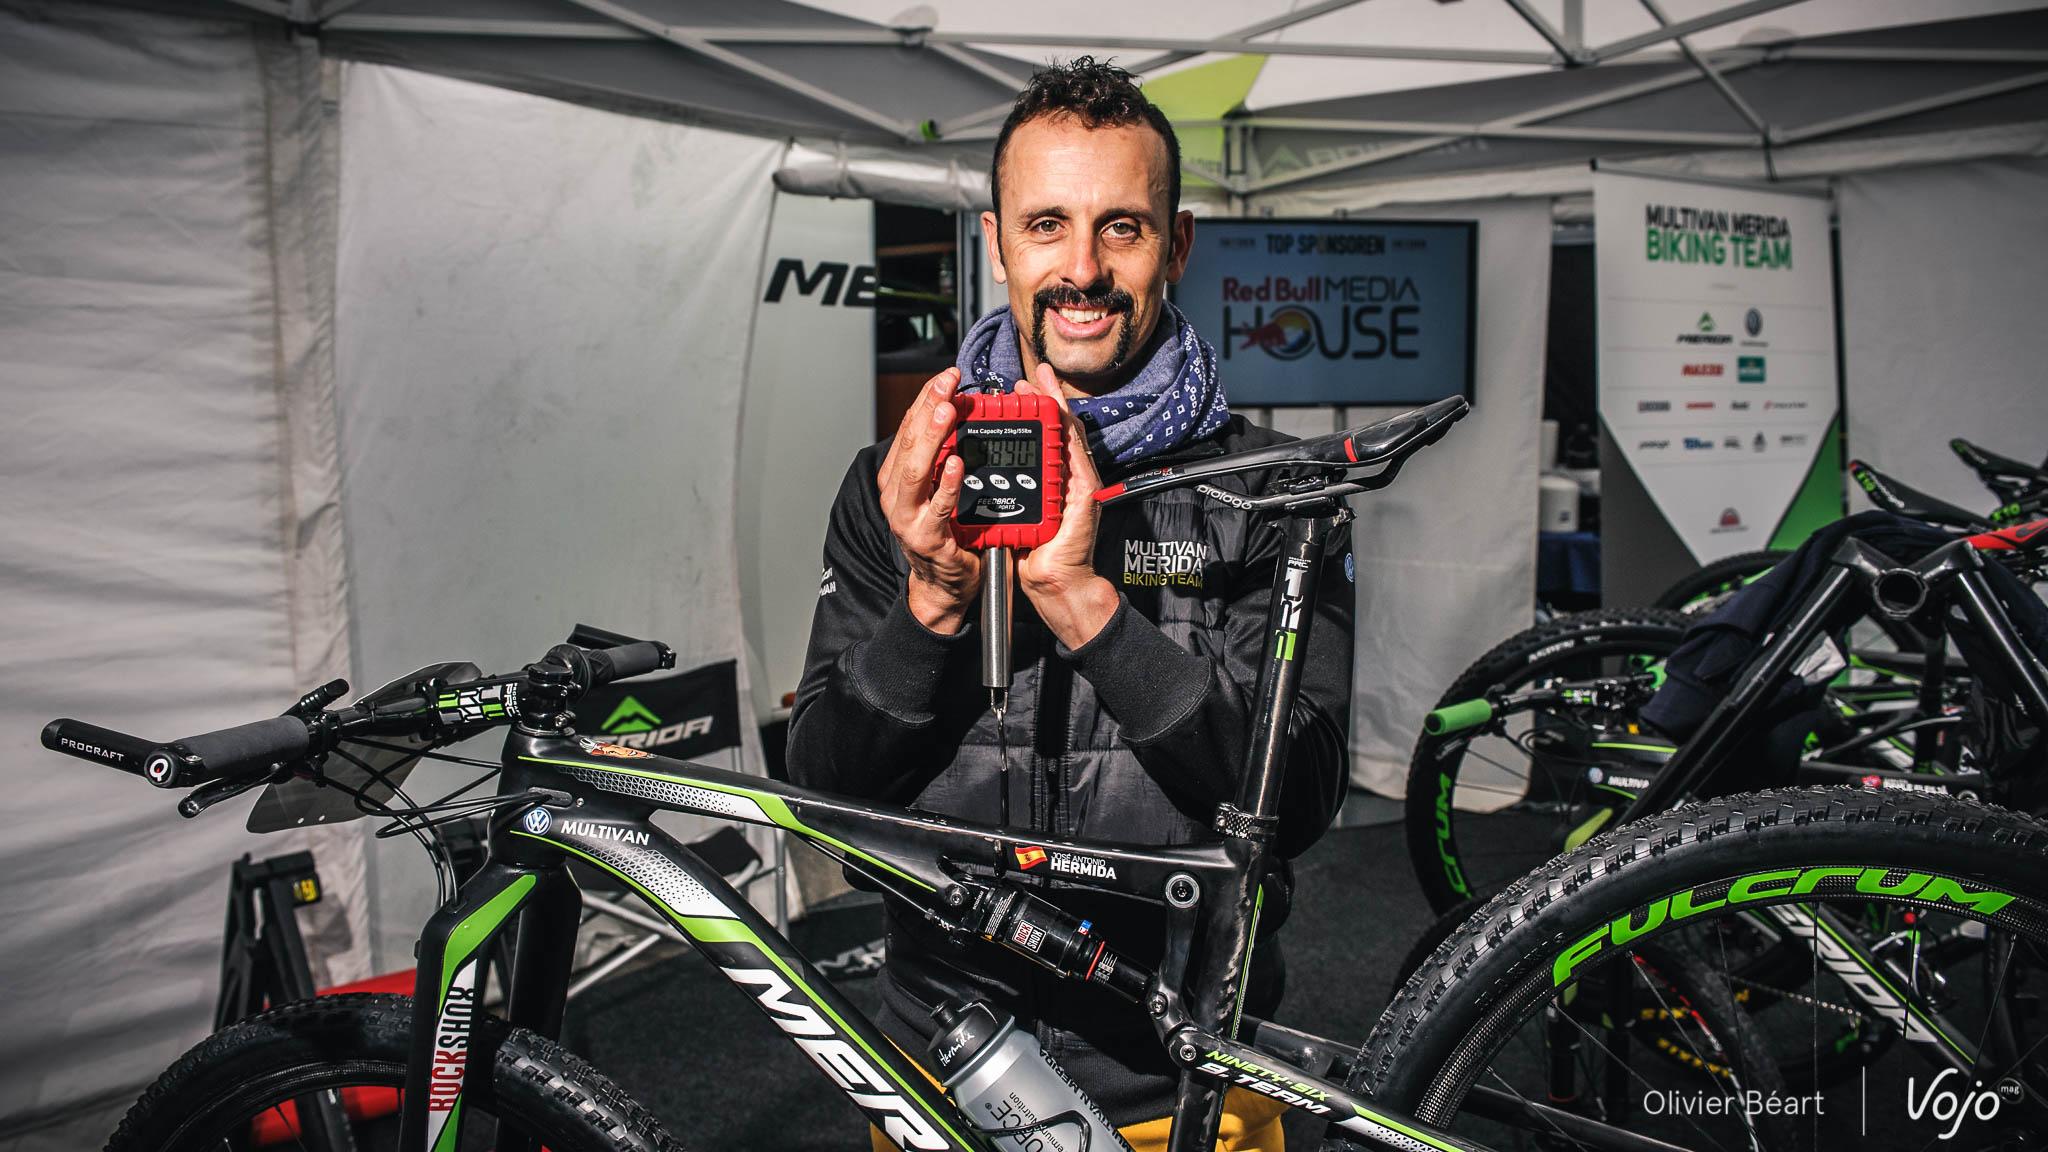 World_Cup_MTB_Pro_Bike_Check_Merida_96_Team_Jose_Hermida_Copyright_OBeart_VojoMag-2